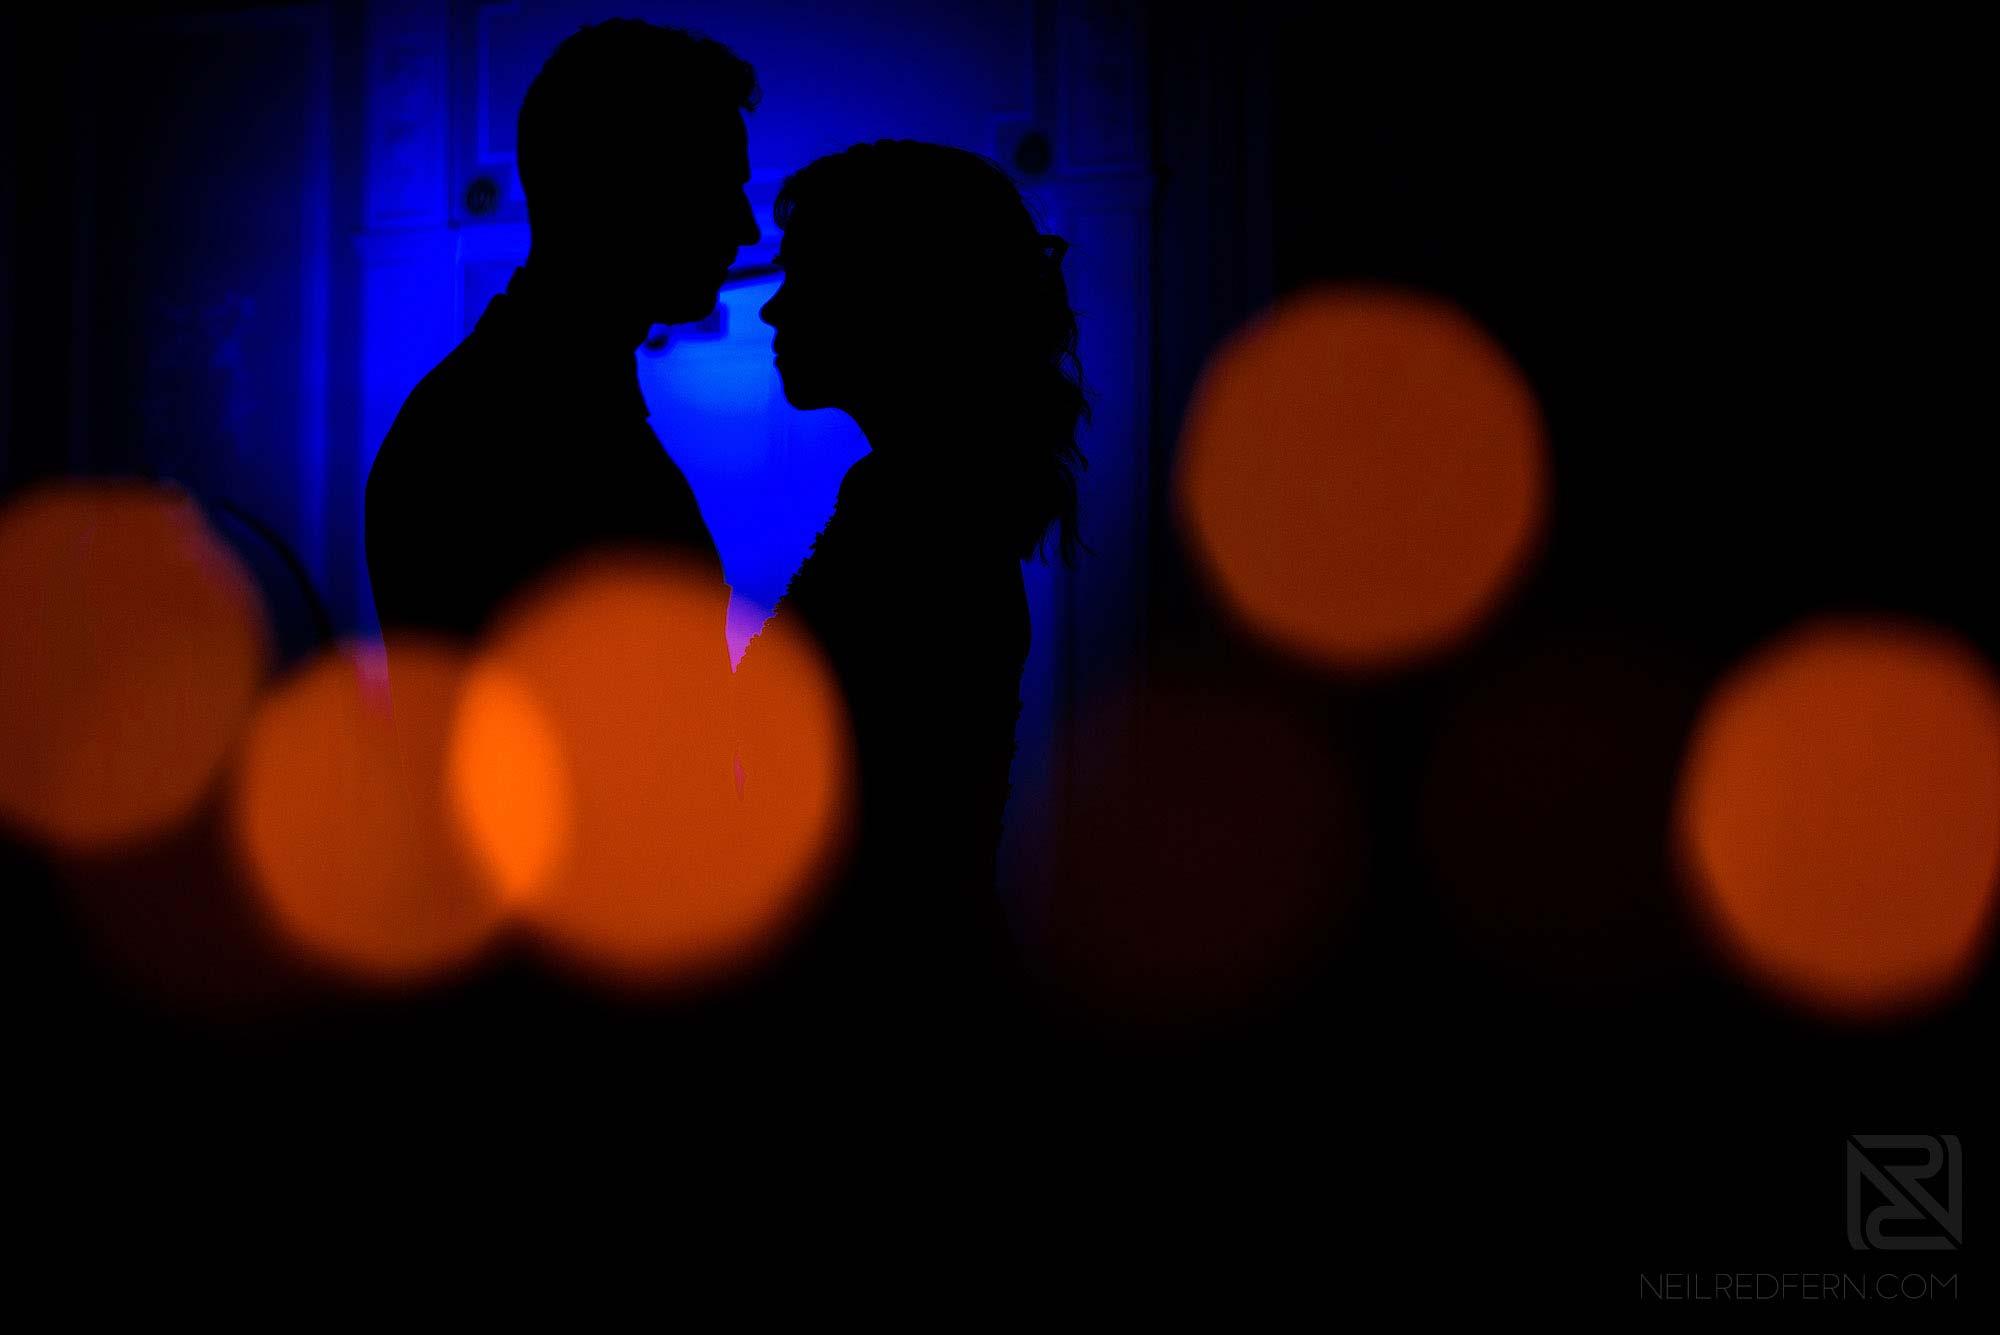 off camera flash wedding portrait using magmods